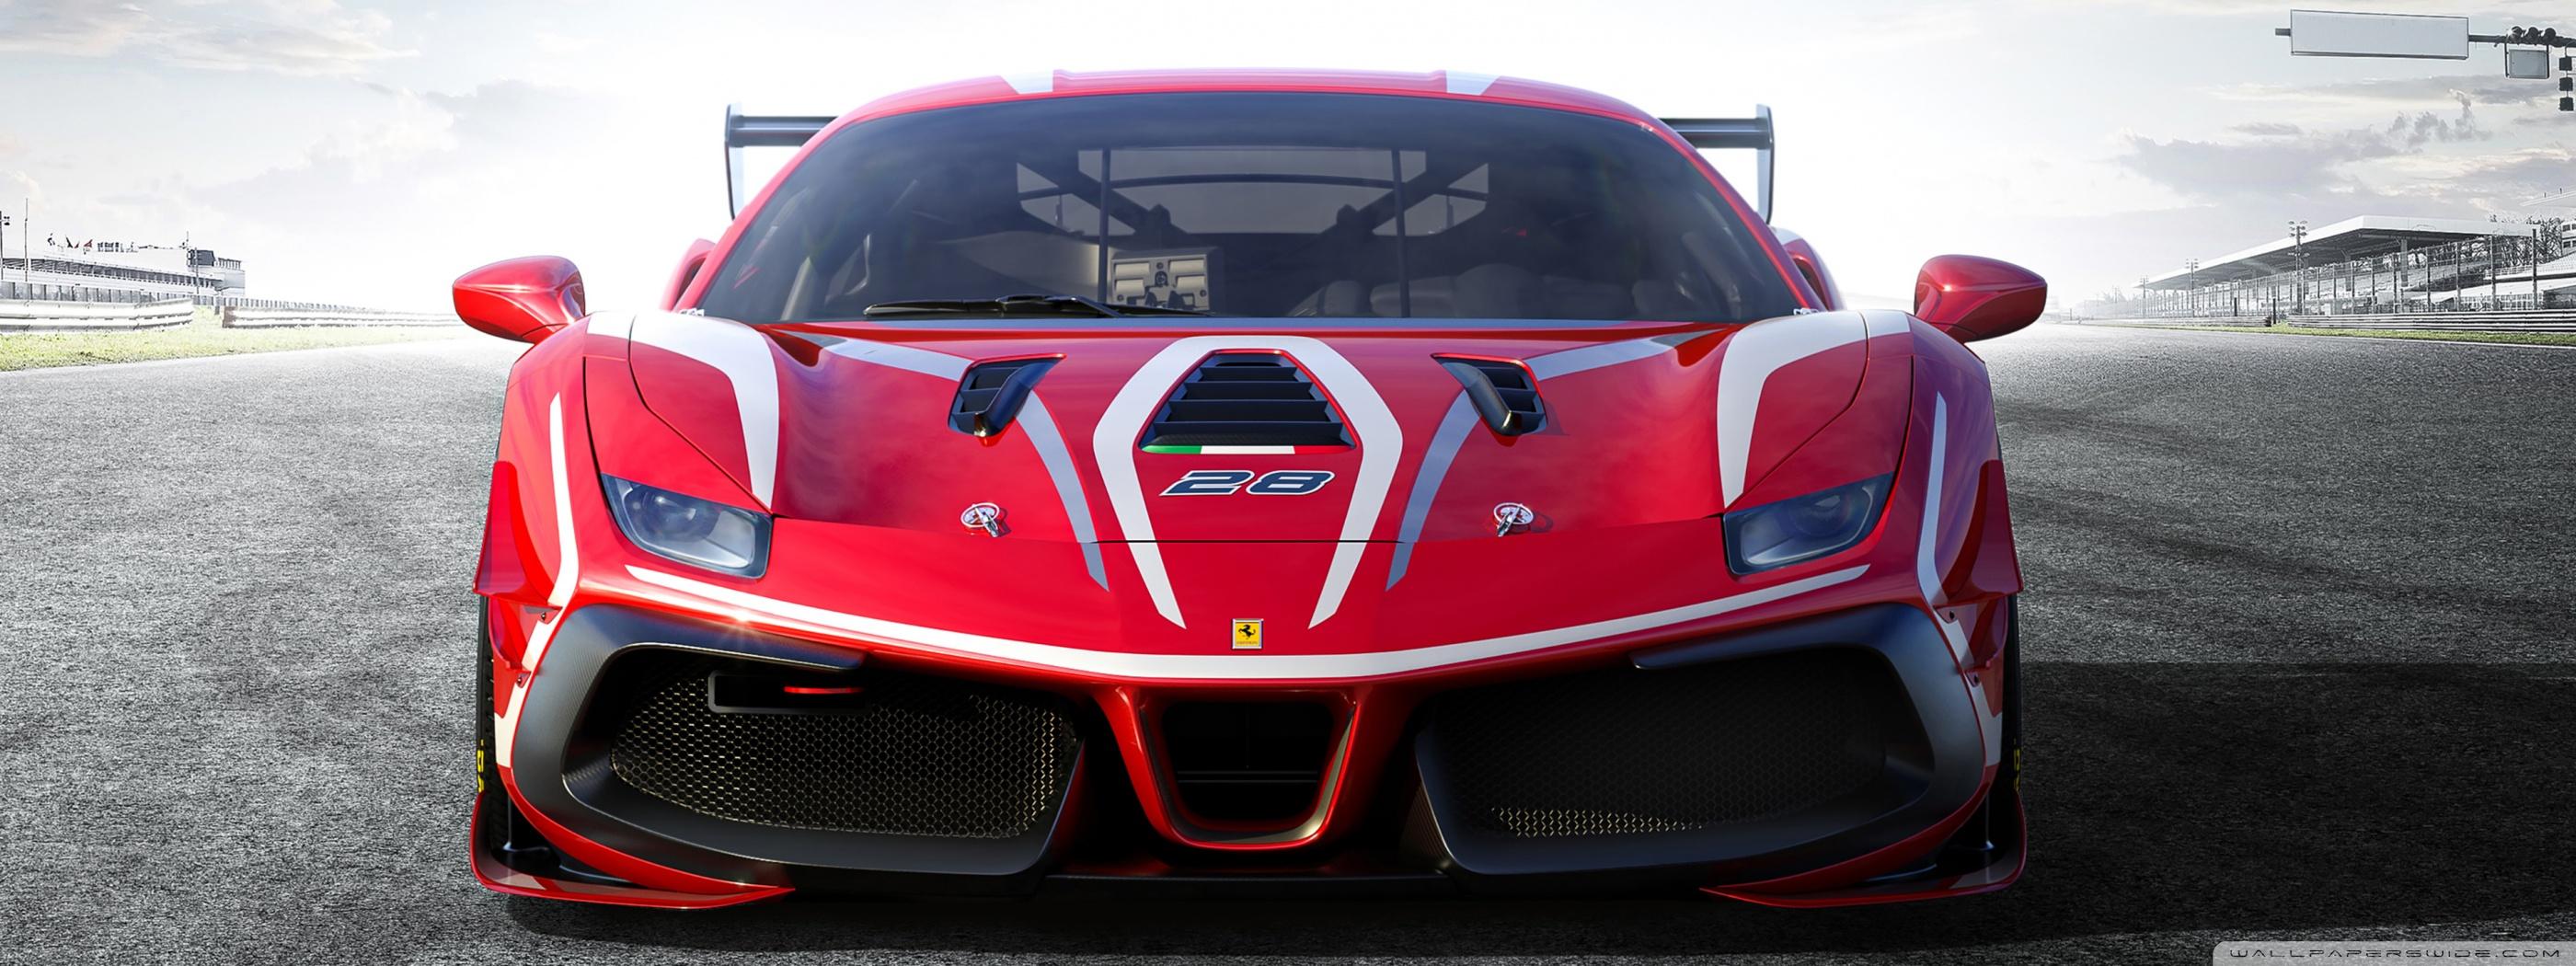 Ferrari 488 Challenge Evo Race Car 2020 Ultra HD Desktop 2800x1050